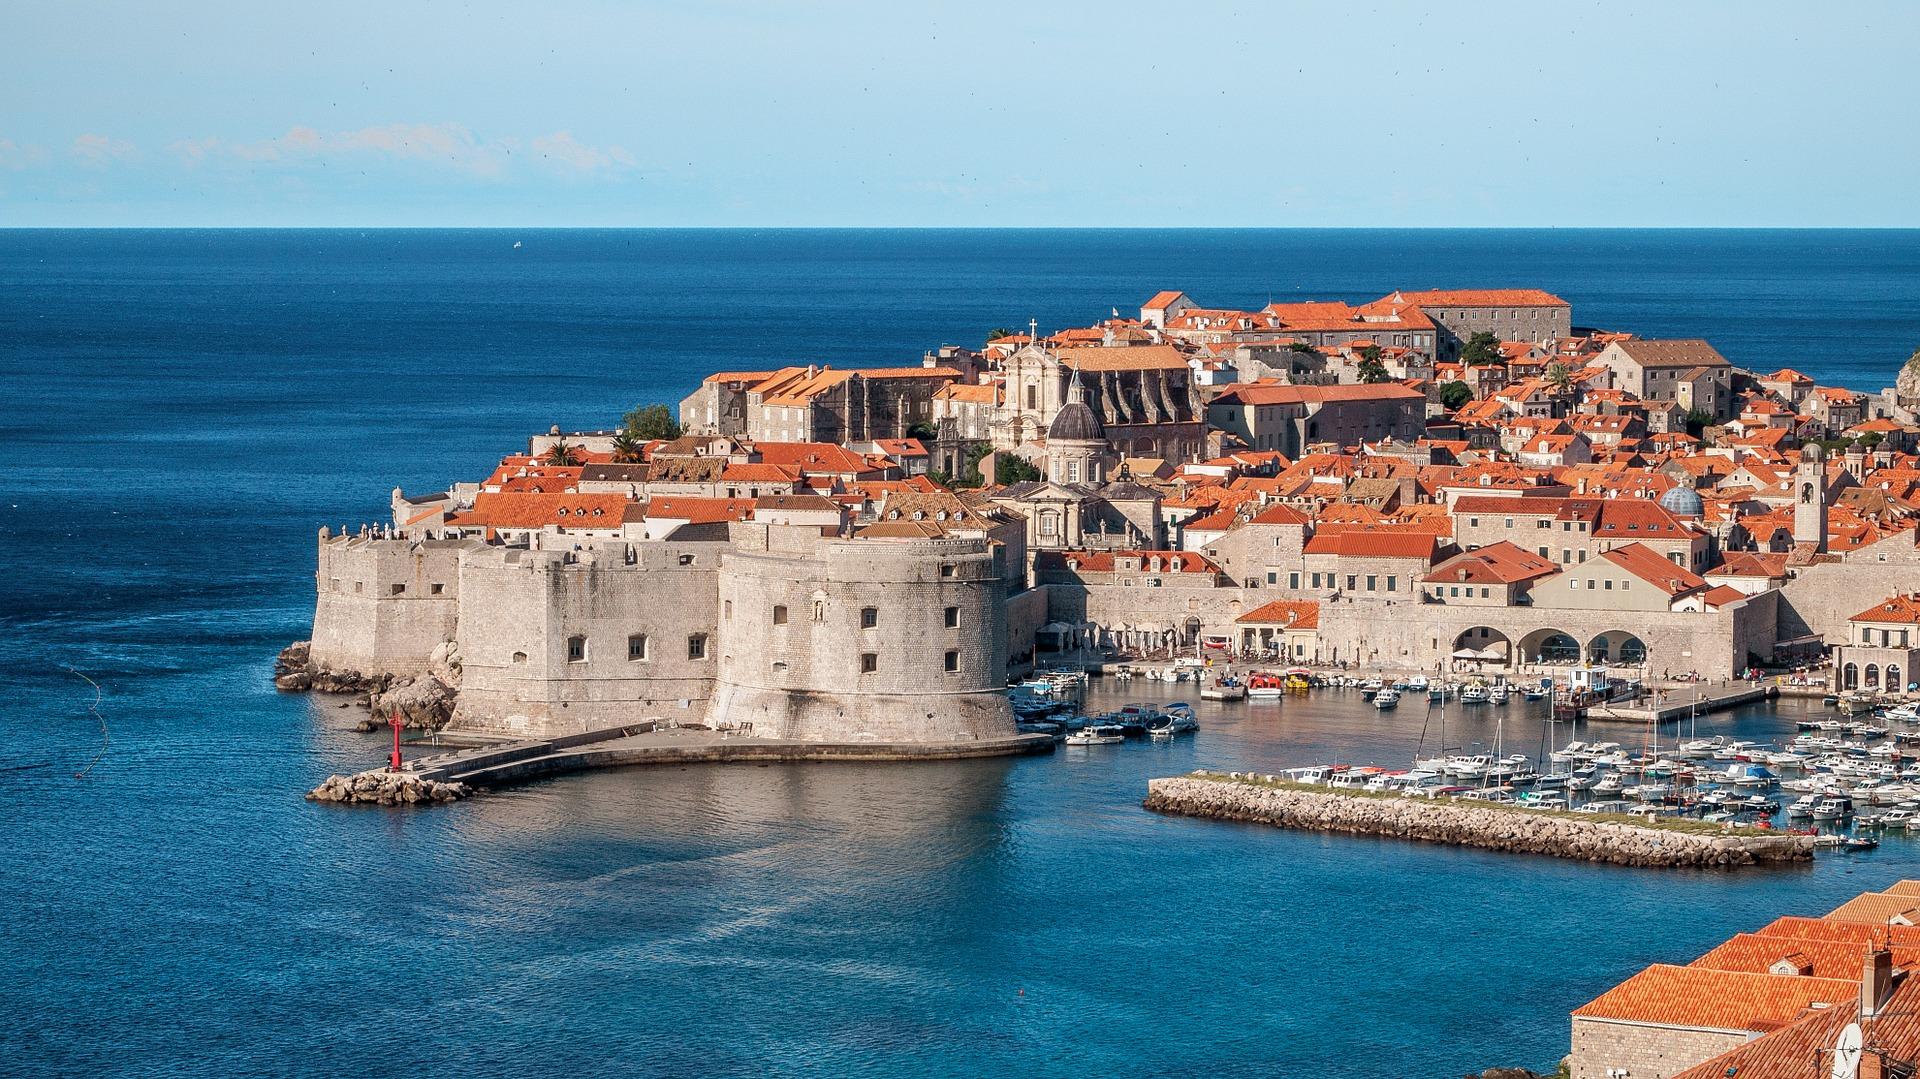 Dubrovnik - King's Landing